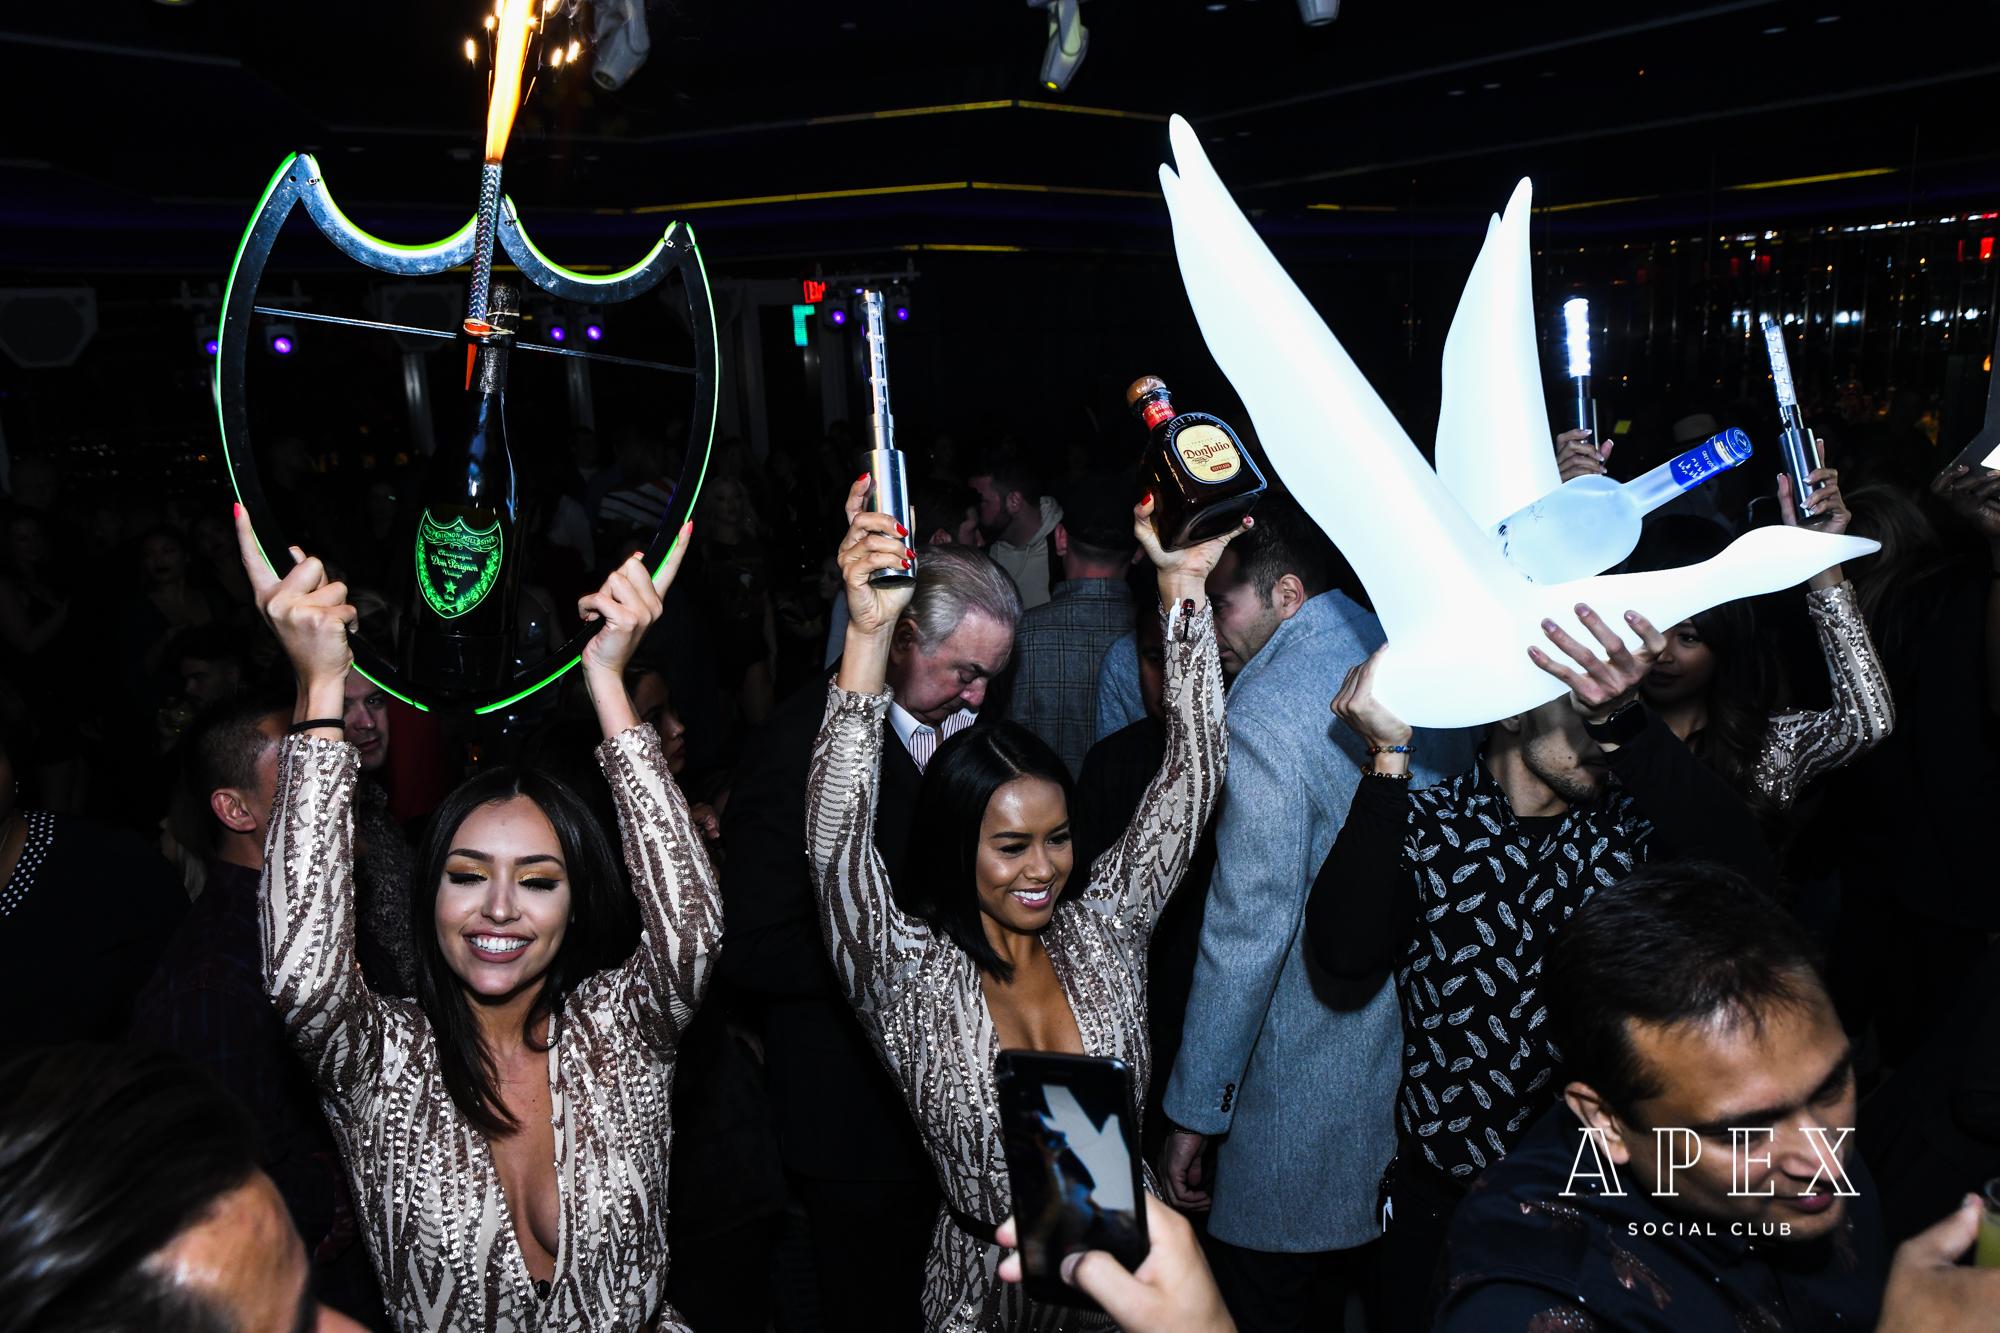 bottle service at apex social club in las vegas